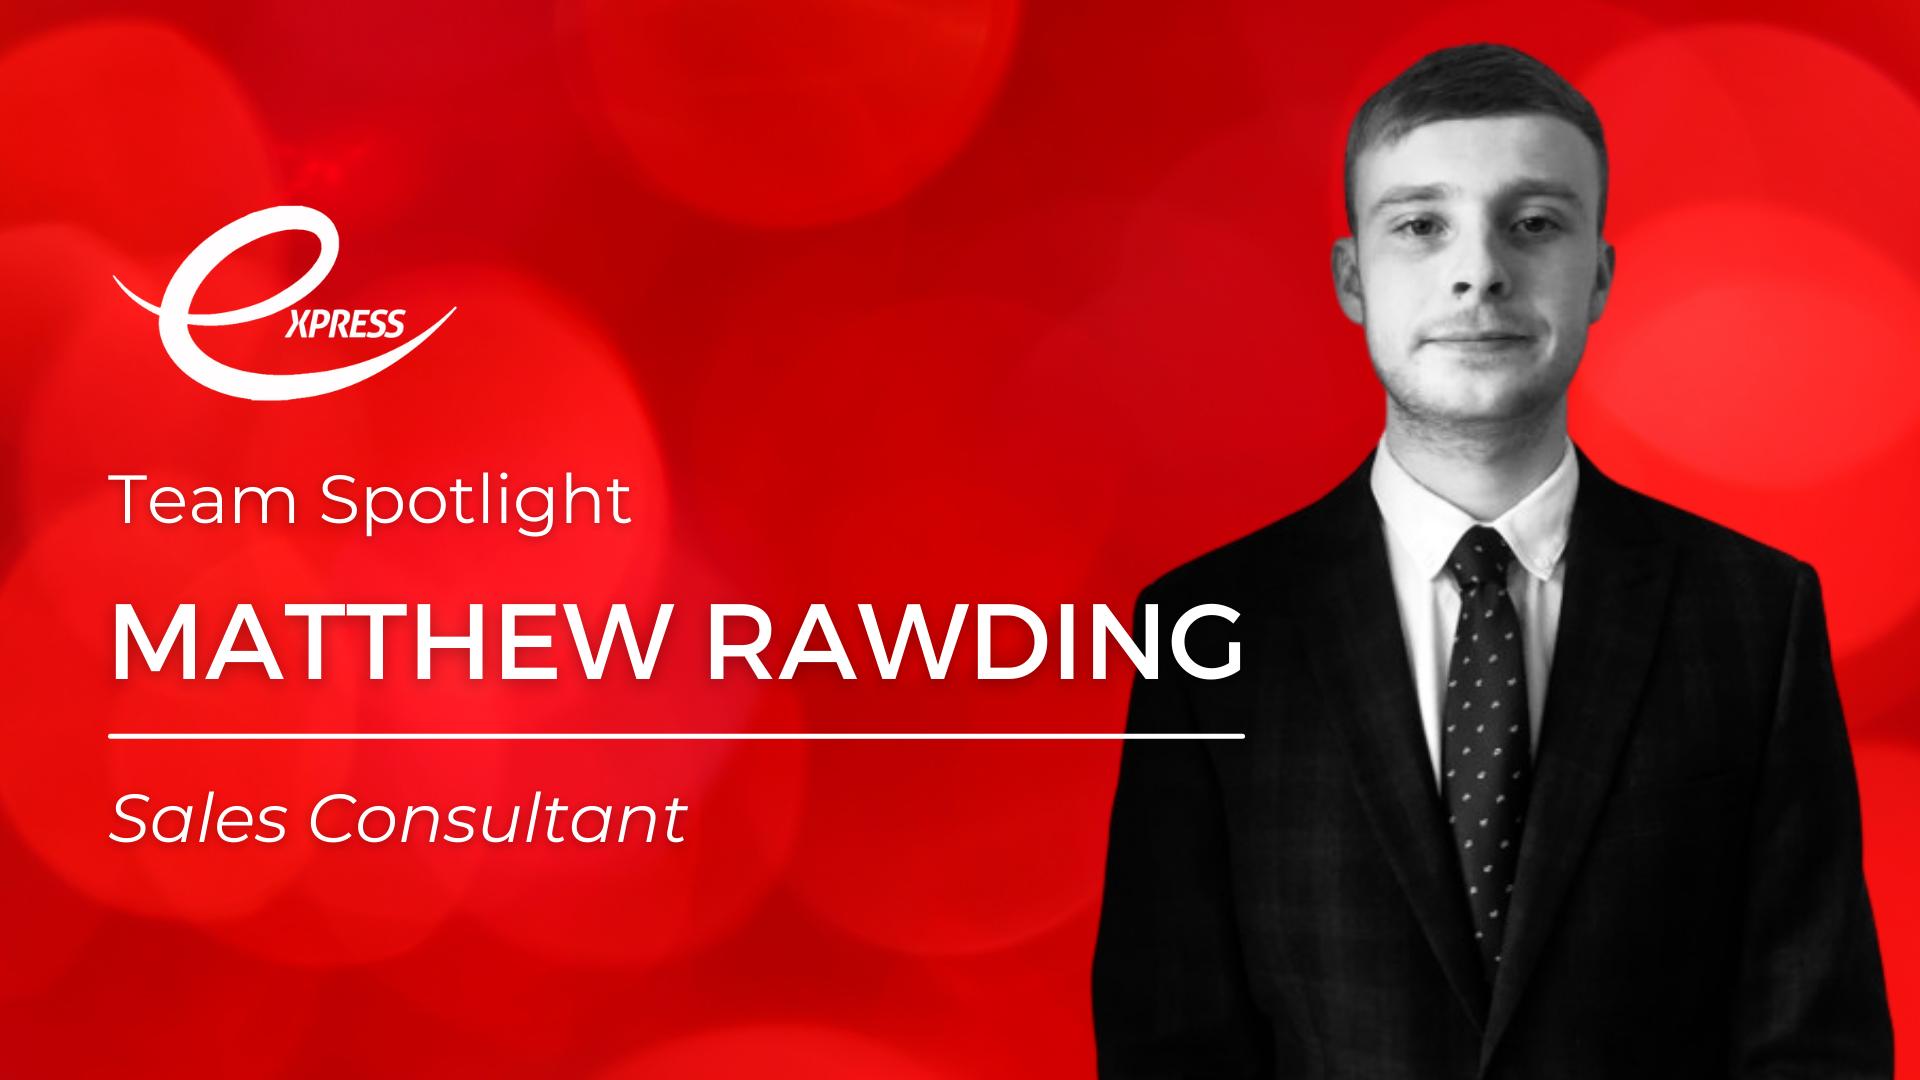 Team Spotlight: Matthew Rawding - Express Recruitment Sales Consultant